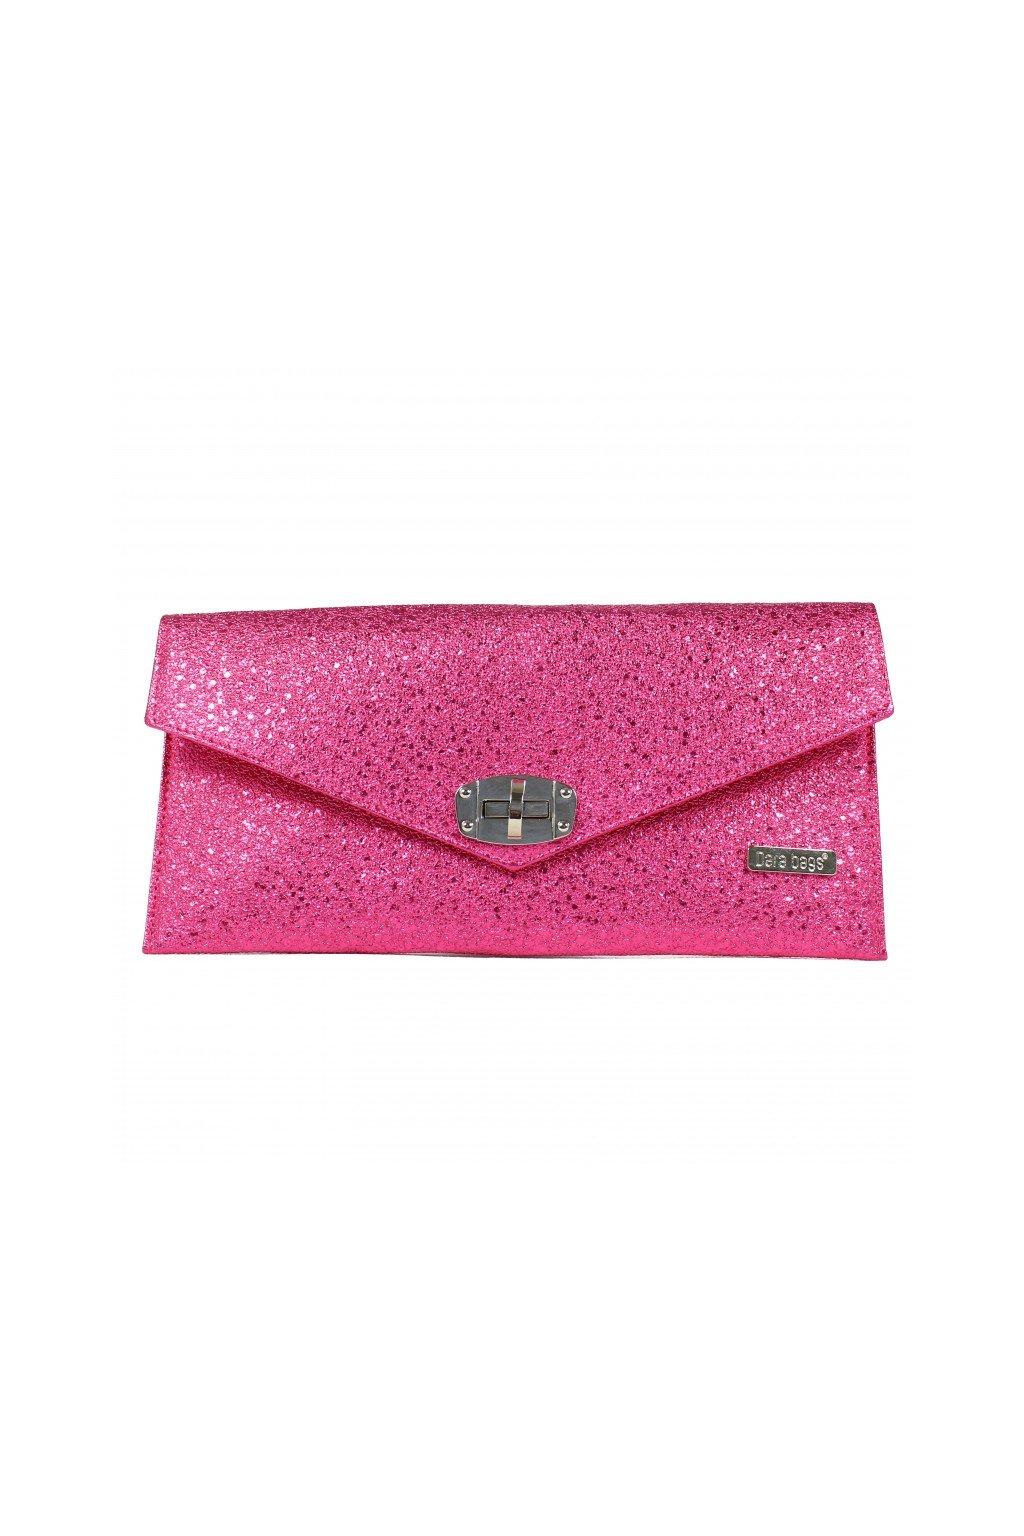 Mala trpytiva kabelka Malibu Classy Dara bags ruzova 1